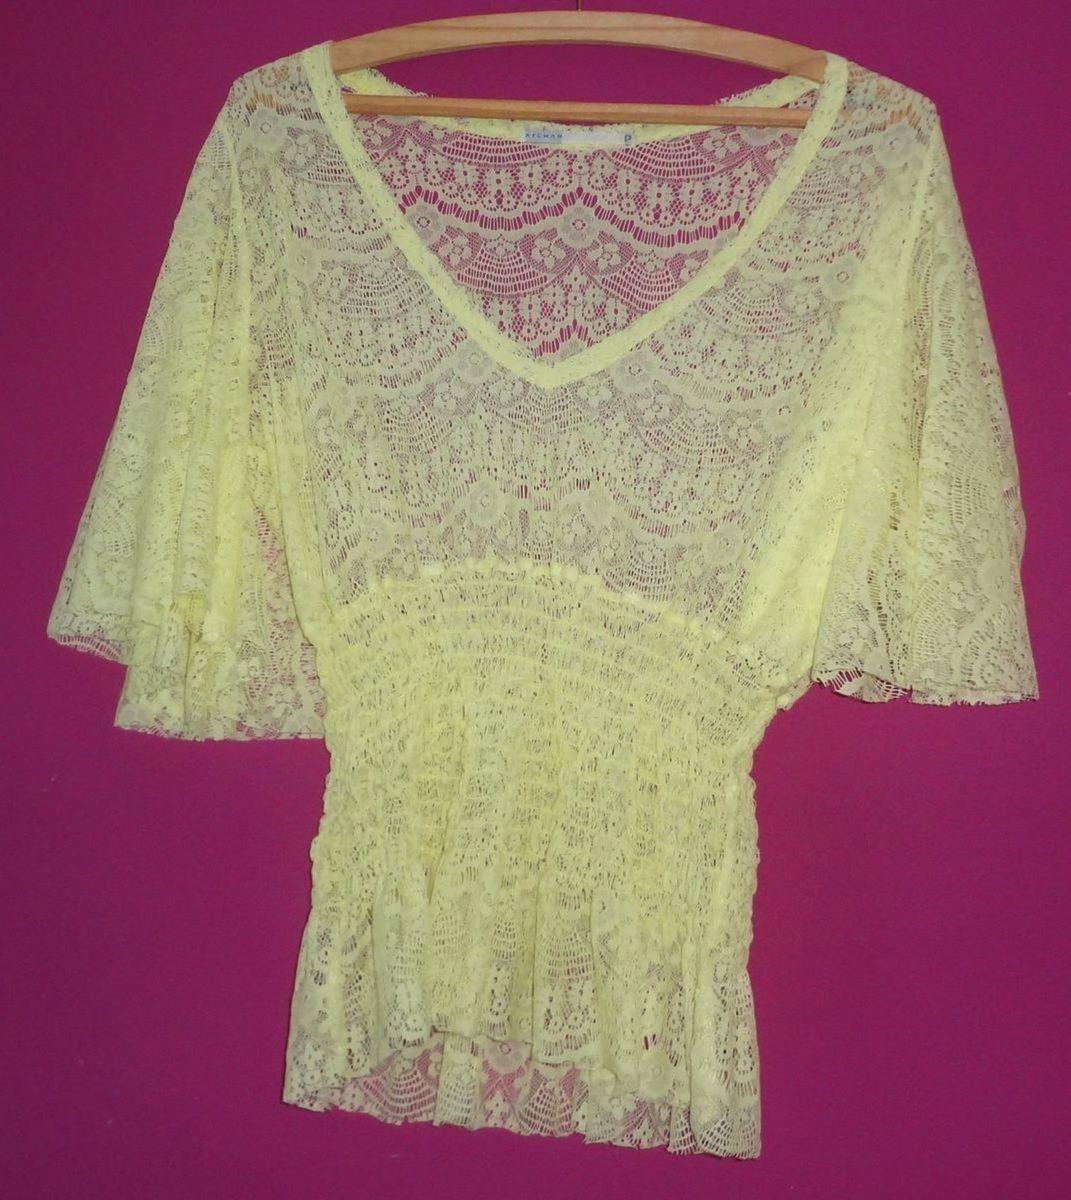 2adfb6799c blusa de renda - blusas afghan.  Czm6ly9wag90b3muzw5qb2vplmnvbs5ici9wcm9kdwn0cy8ynza1ntavn2uzmtrkodq1nwnkytfmzju0ogmxmja1y2uwnmqymmyuanbn